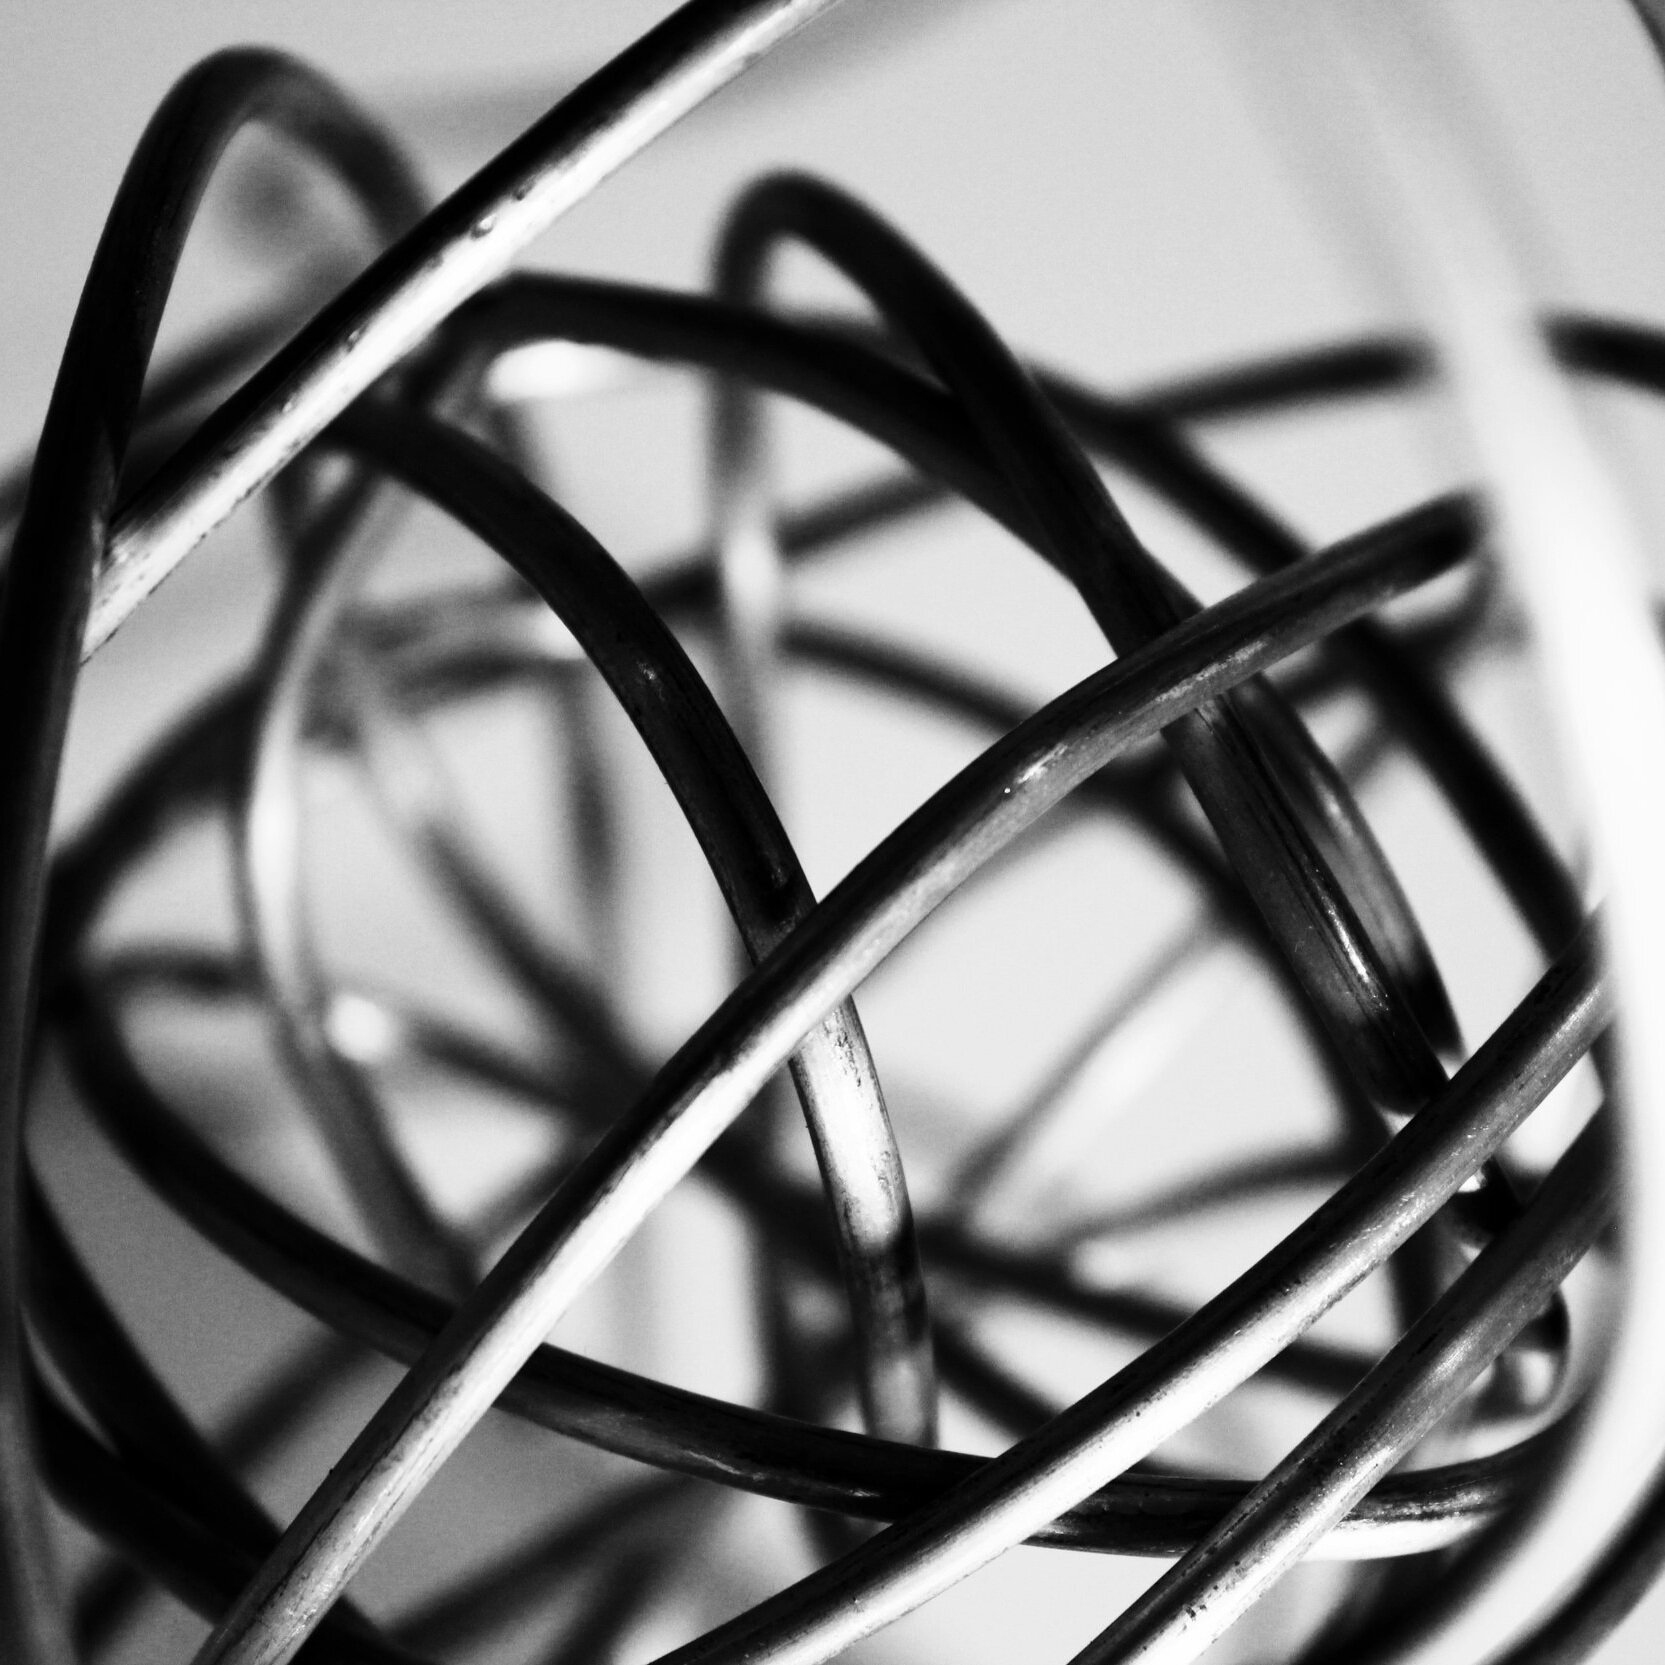 B&W - mixed media experiments exploring motion & emotion